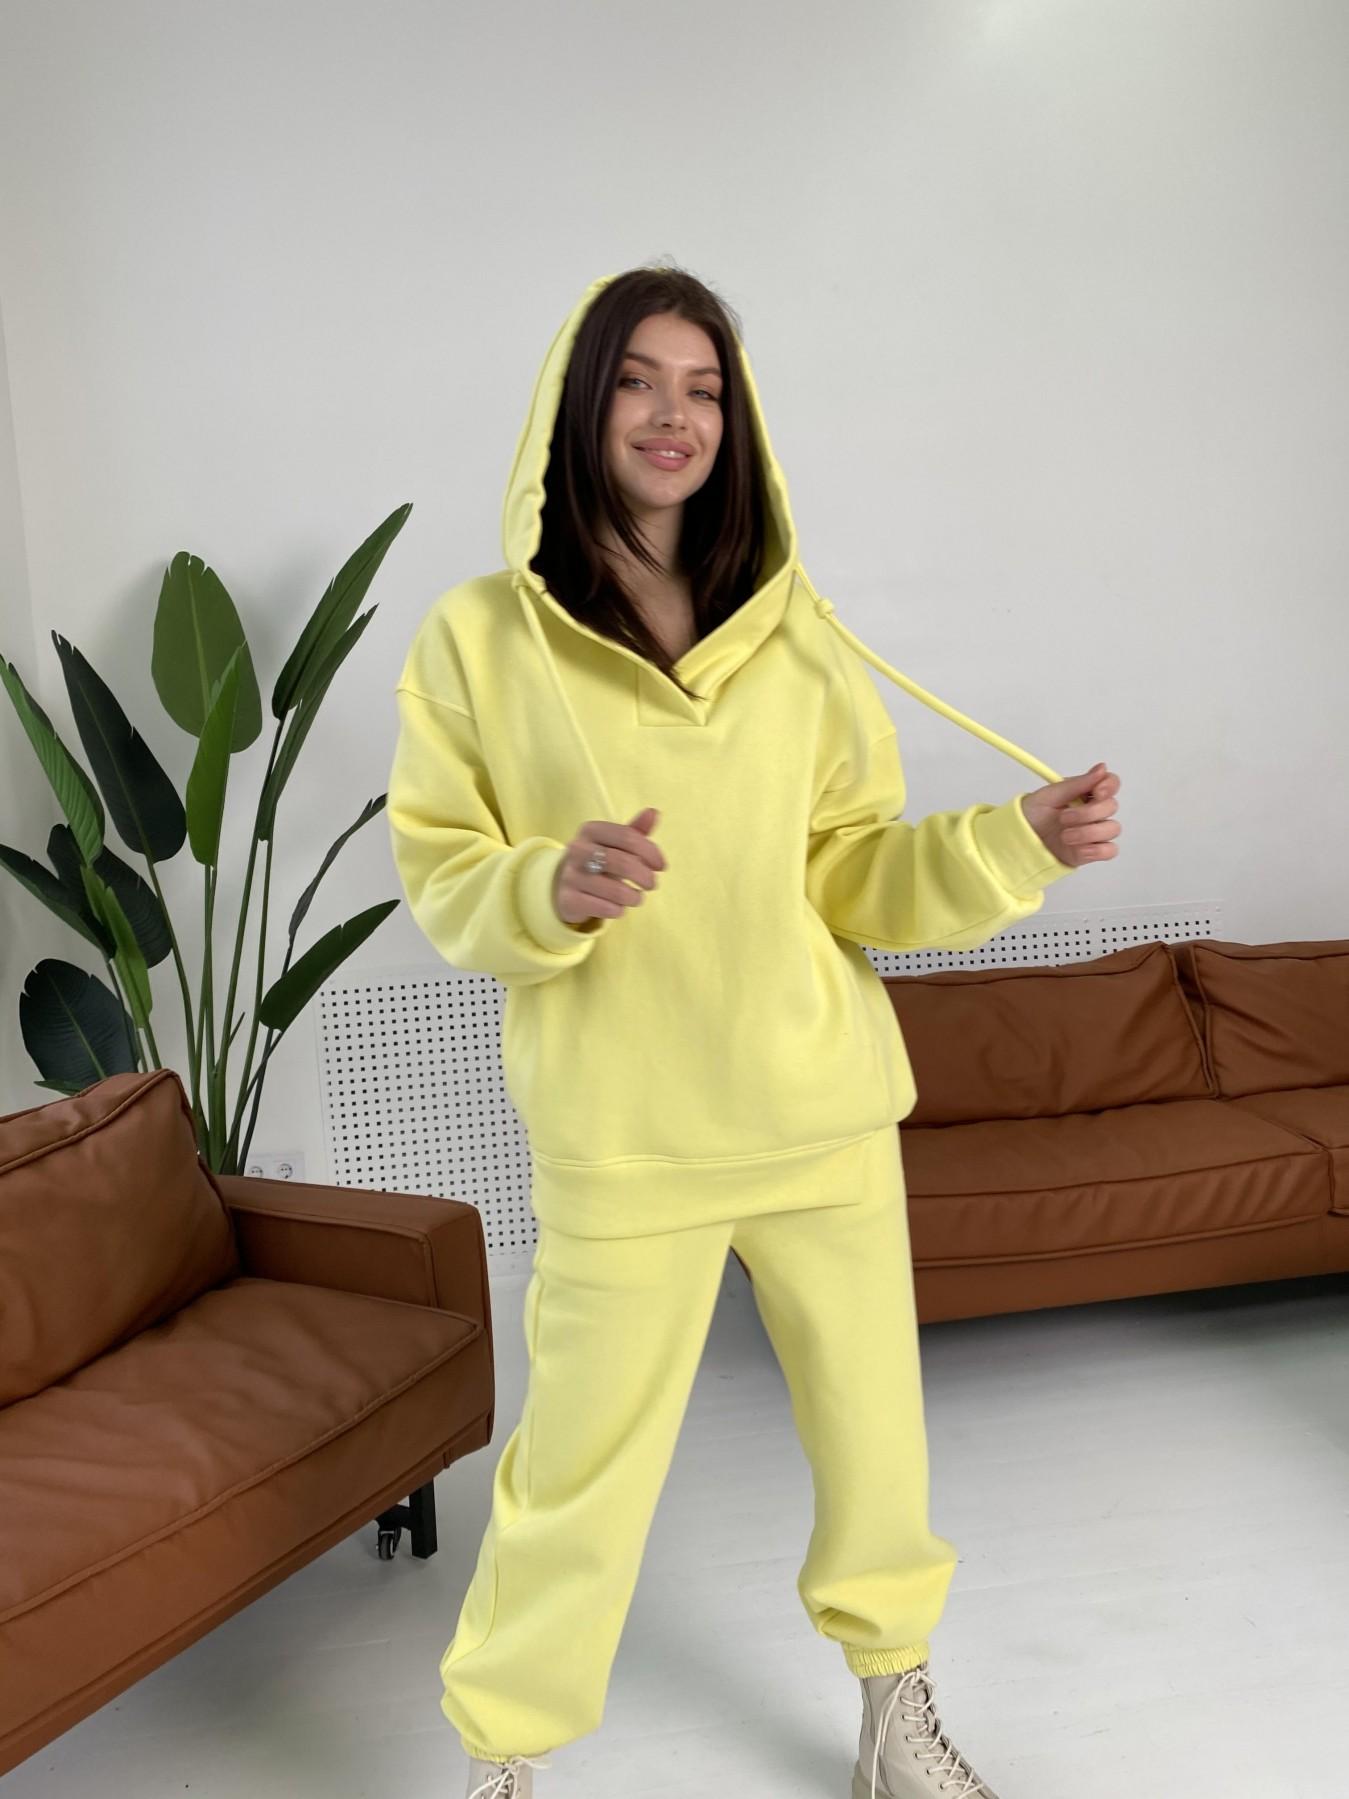 Ярис костюм из 3х нитки 10789 АРТ. 47259 Цвет: Лимон - фото 8, интернет магазин tm-modus.ru